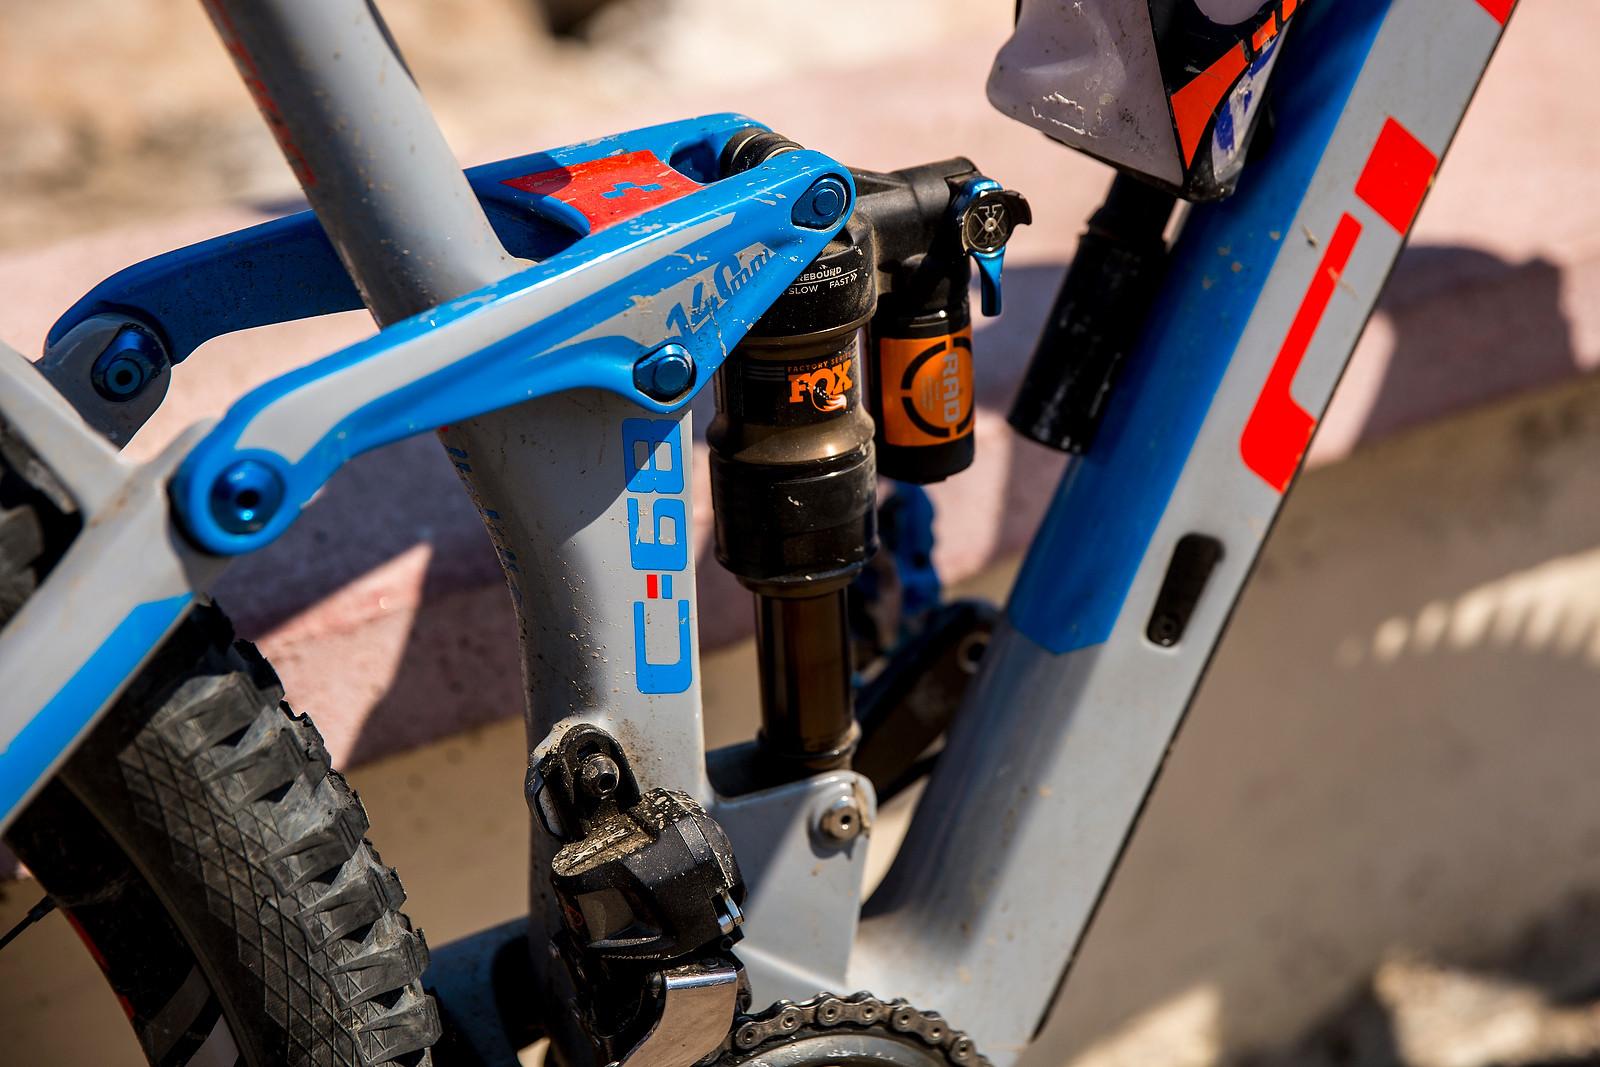 FOX Float X RAD with EVOL - WINNING BIKE: Nico Lau's Cube Stereo 140 29 - Mountain Biking Pictures - Vital MTB